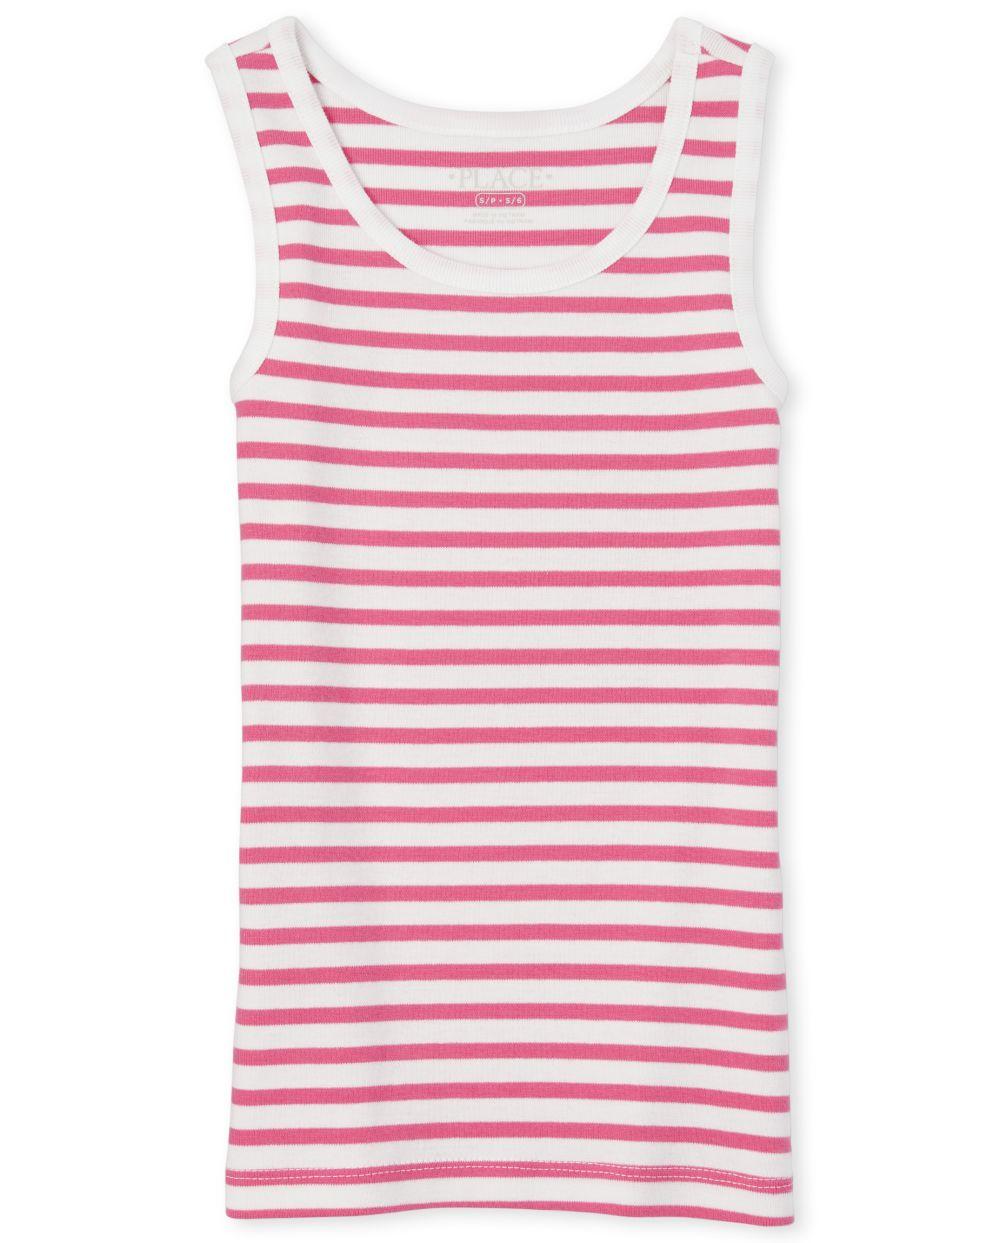 Girls Striped Tank Top